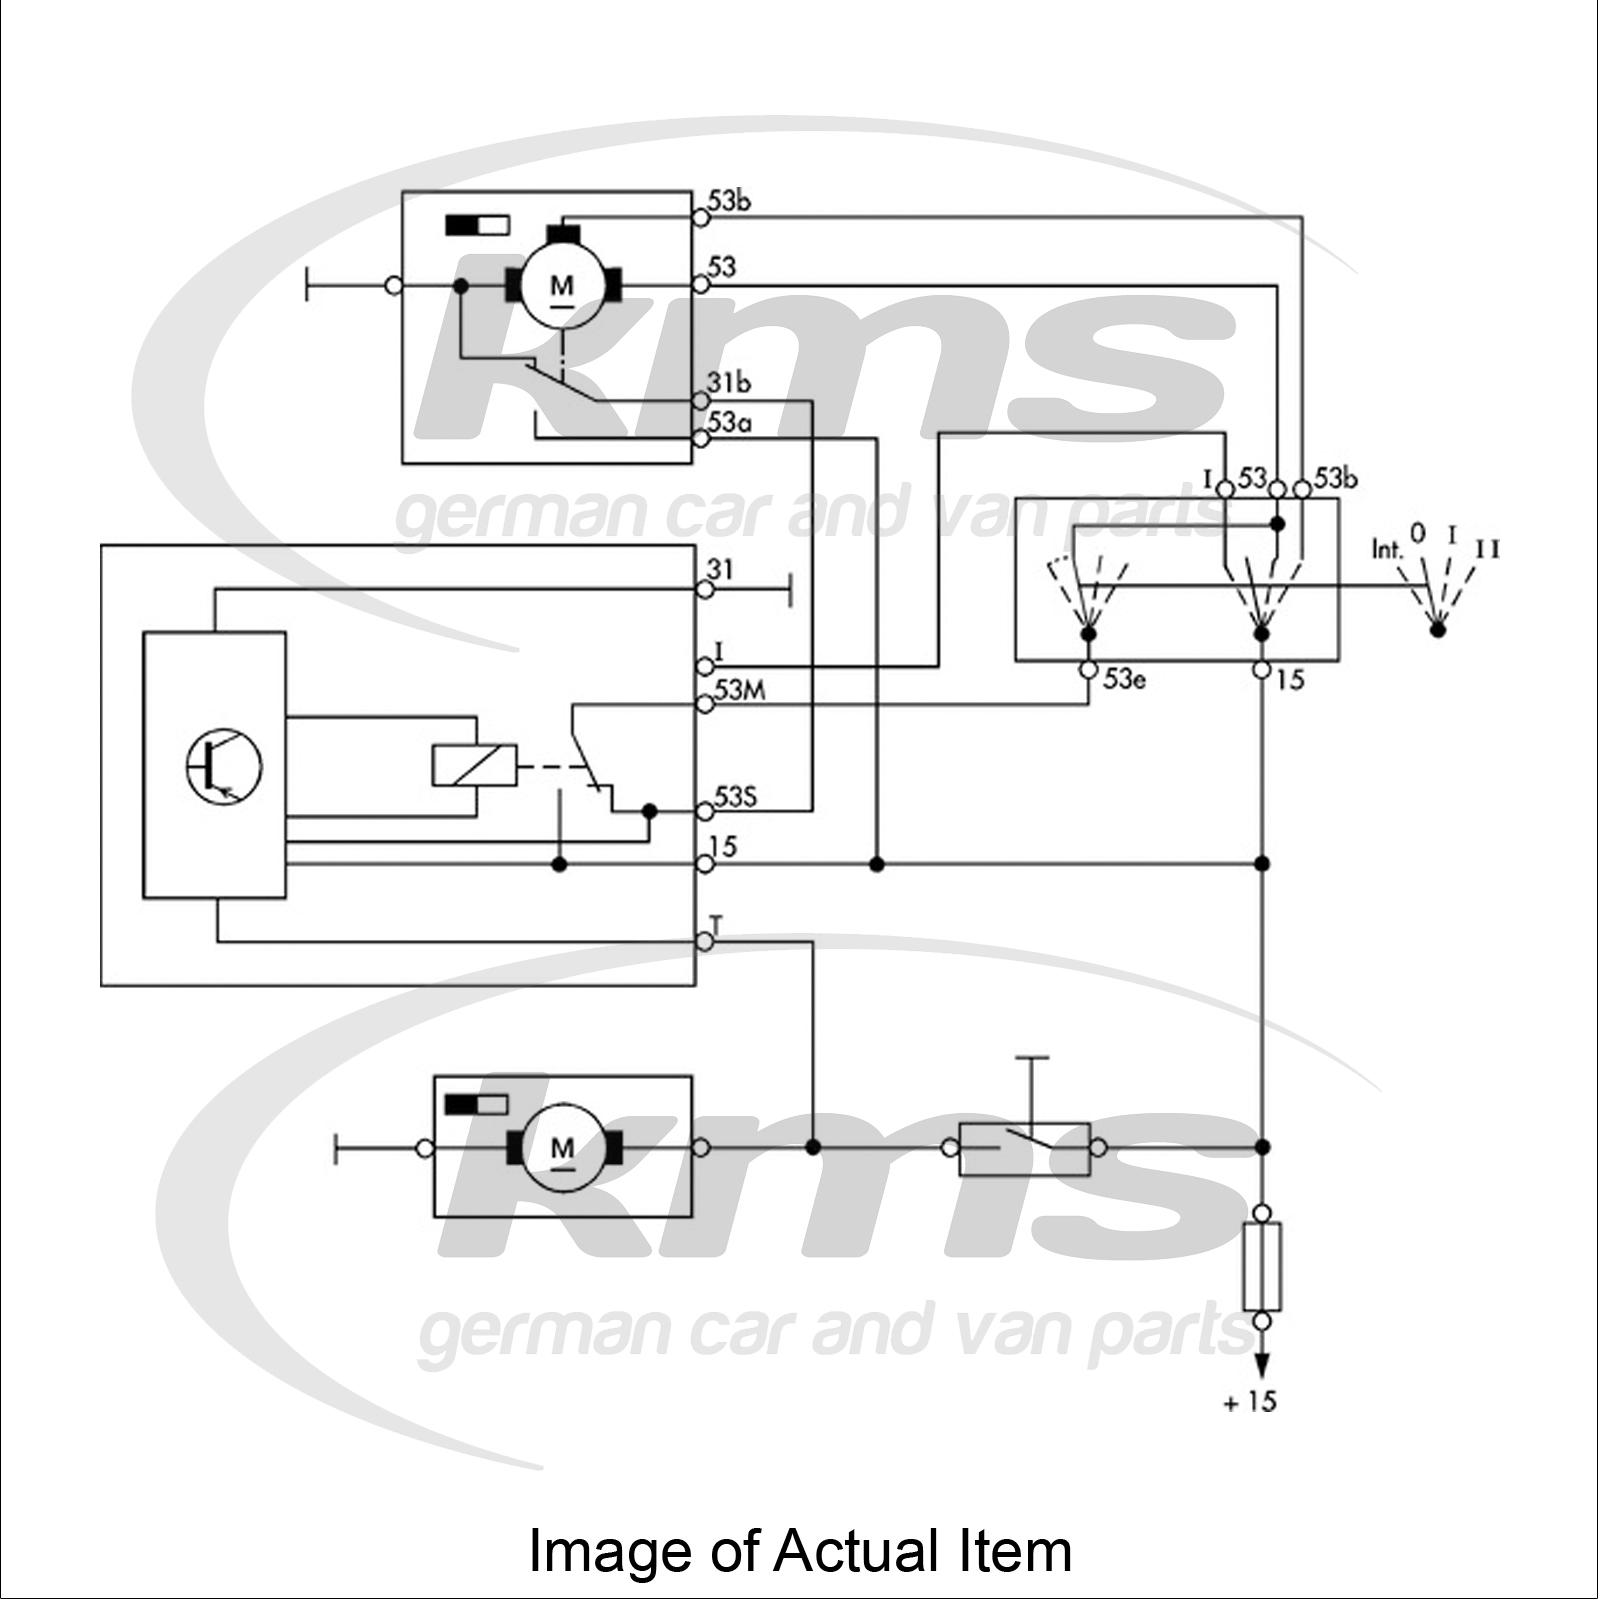 New Genuine Hella Wipe Wash Interval Relay 5wg 003 620 081 Mk2 Top Diagram Sentinel German Quality